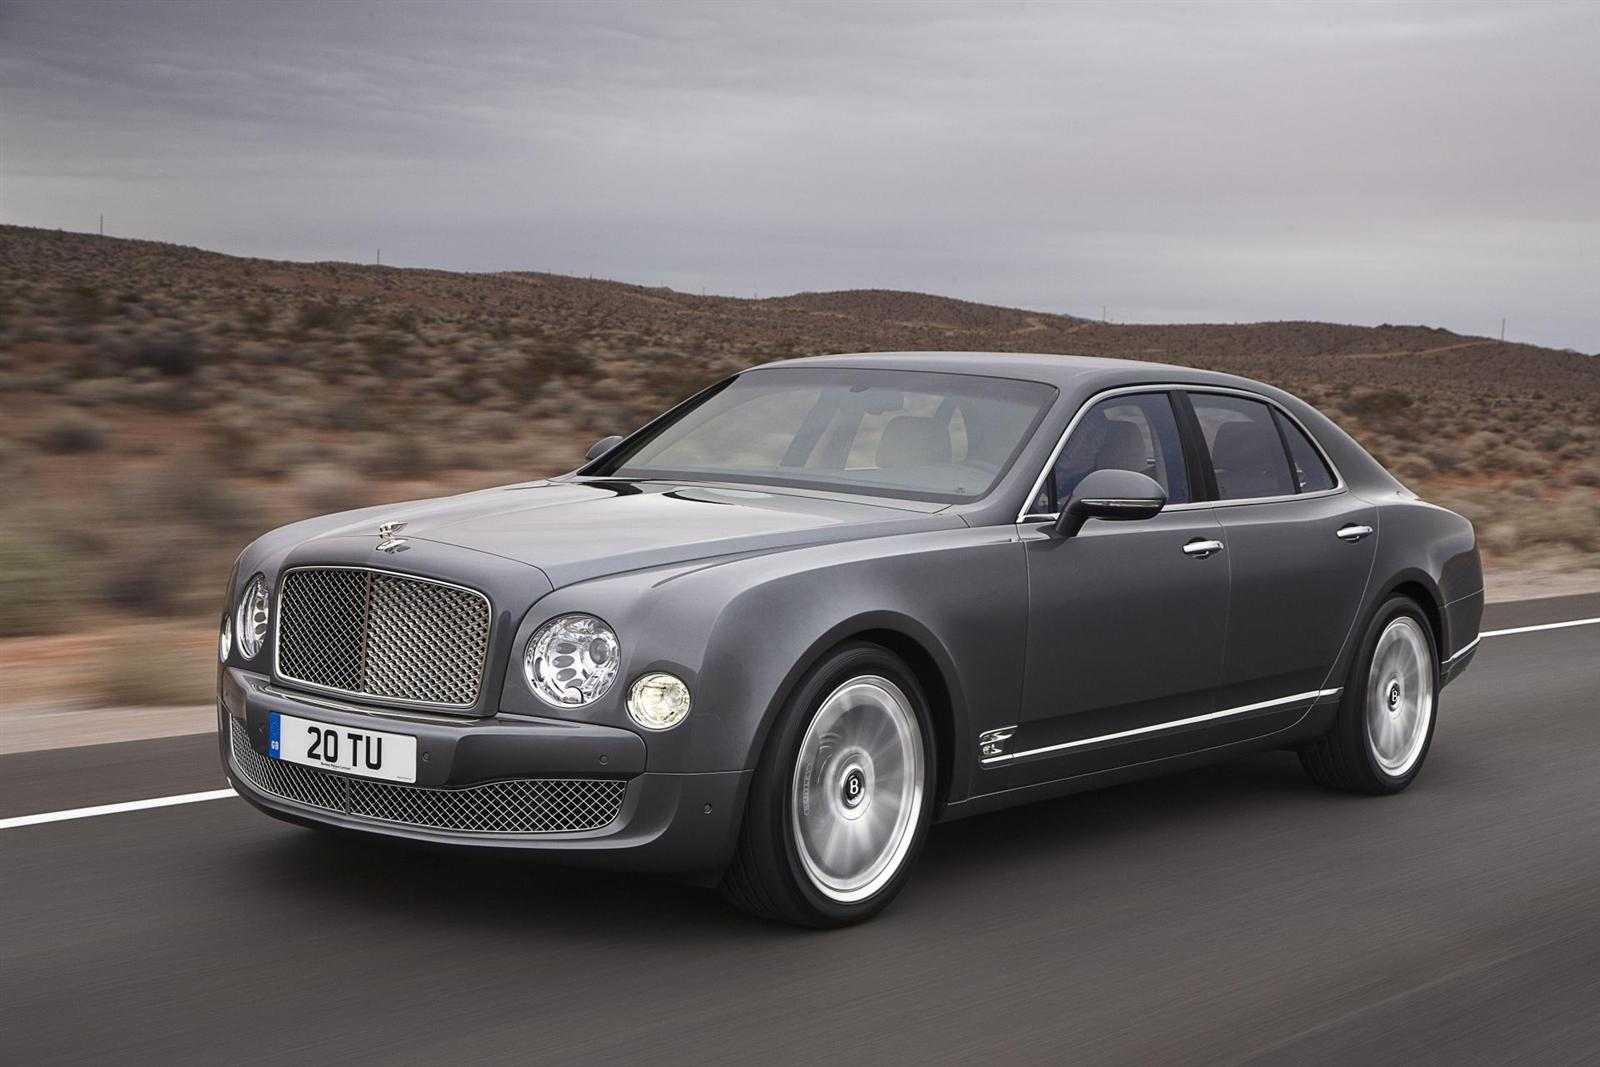 bentley mulsanne luxury executive car branded stuff. Black Bedroom Furniture Sets. Home Design Ideas